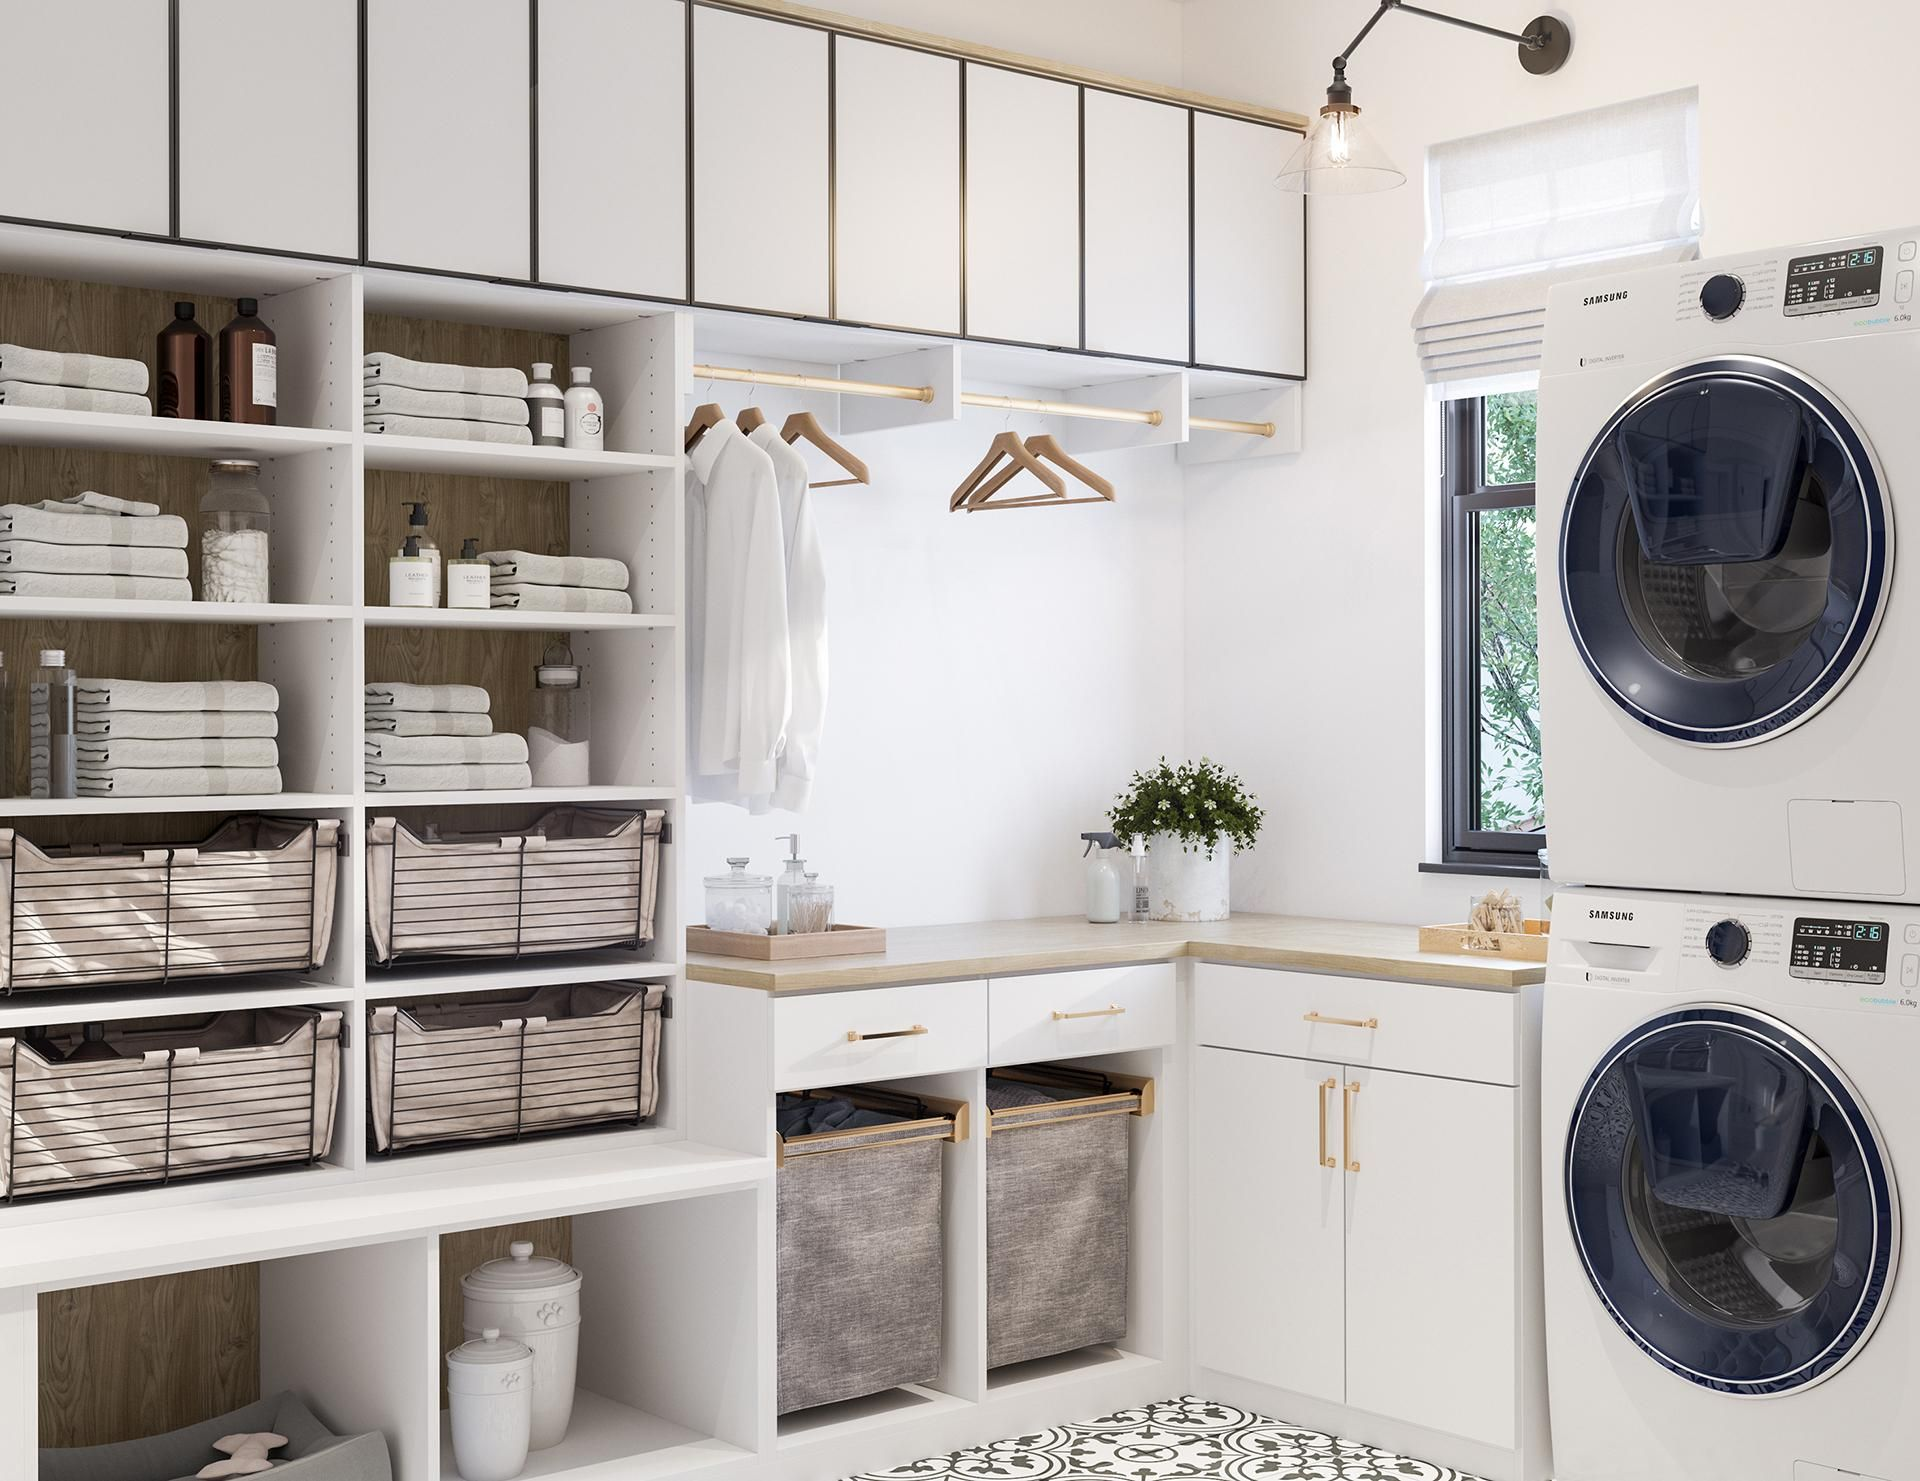 Laundry Room Cabinets Storage Ideas Laundry Room Storage